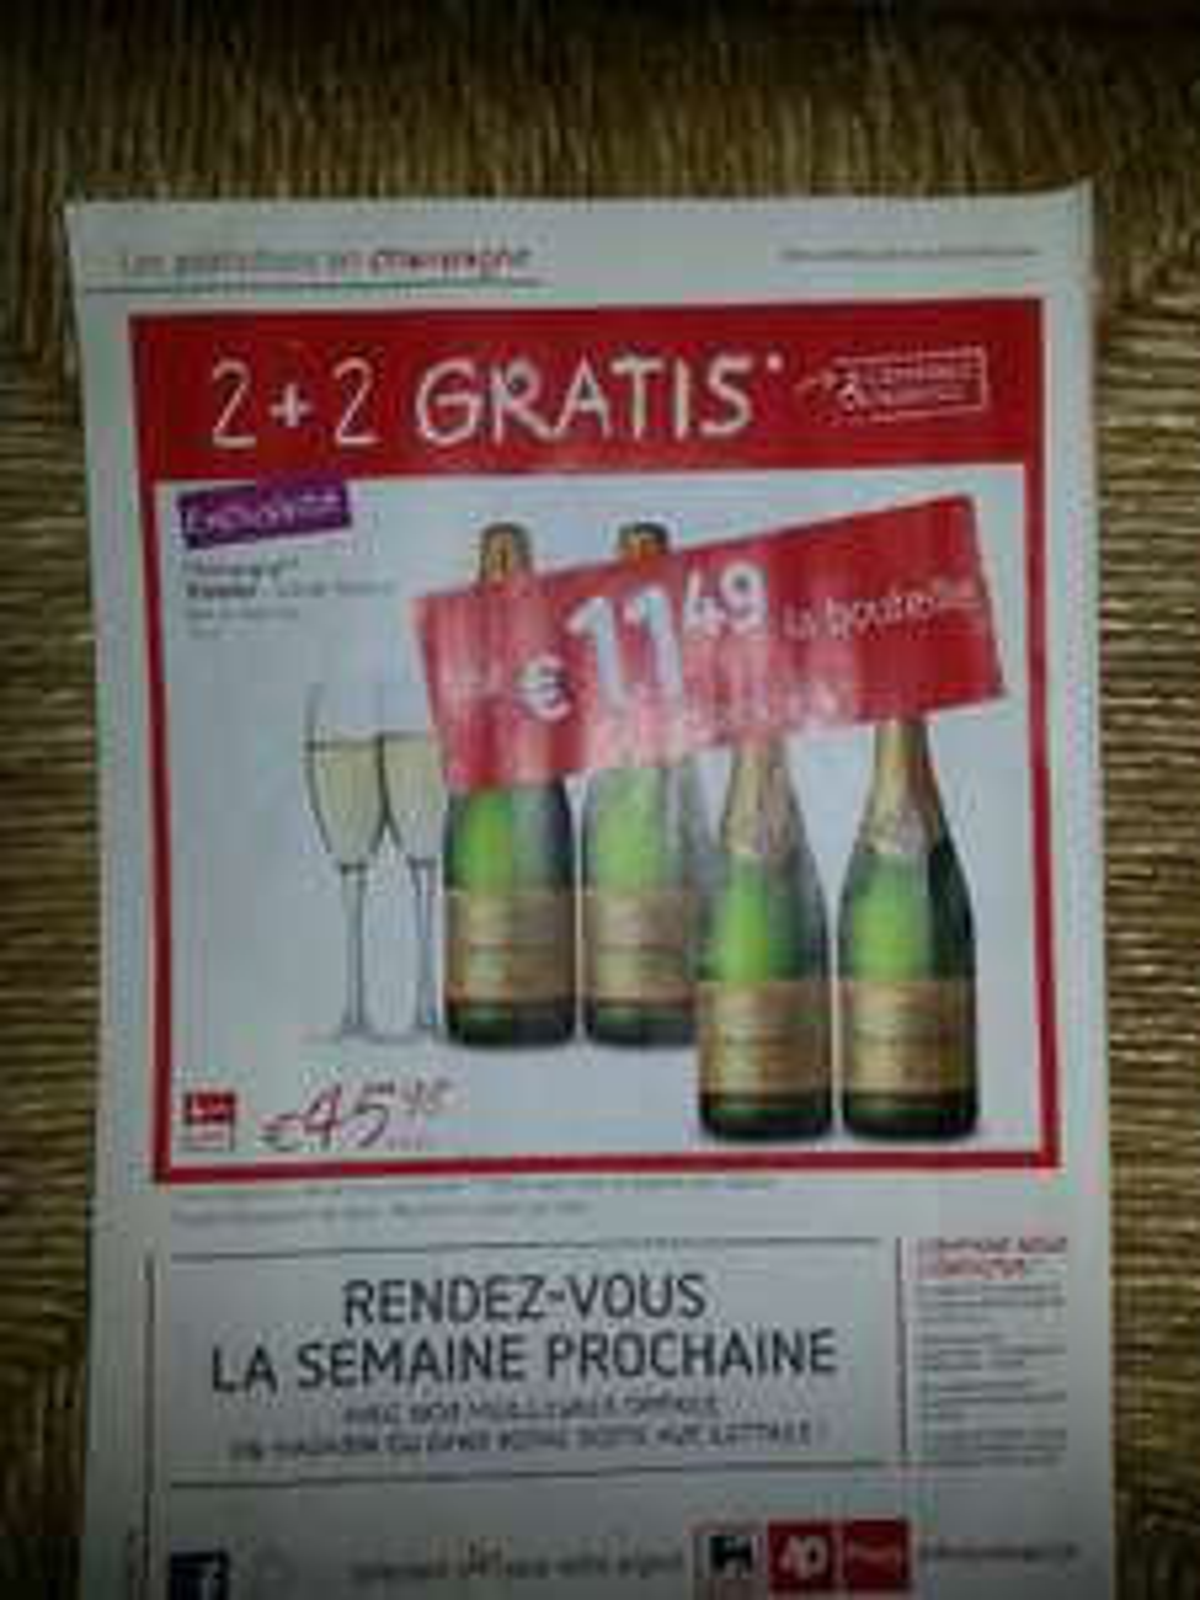 Champagne Vranken - Grande Réserve Brut ou demi-sec